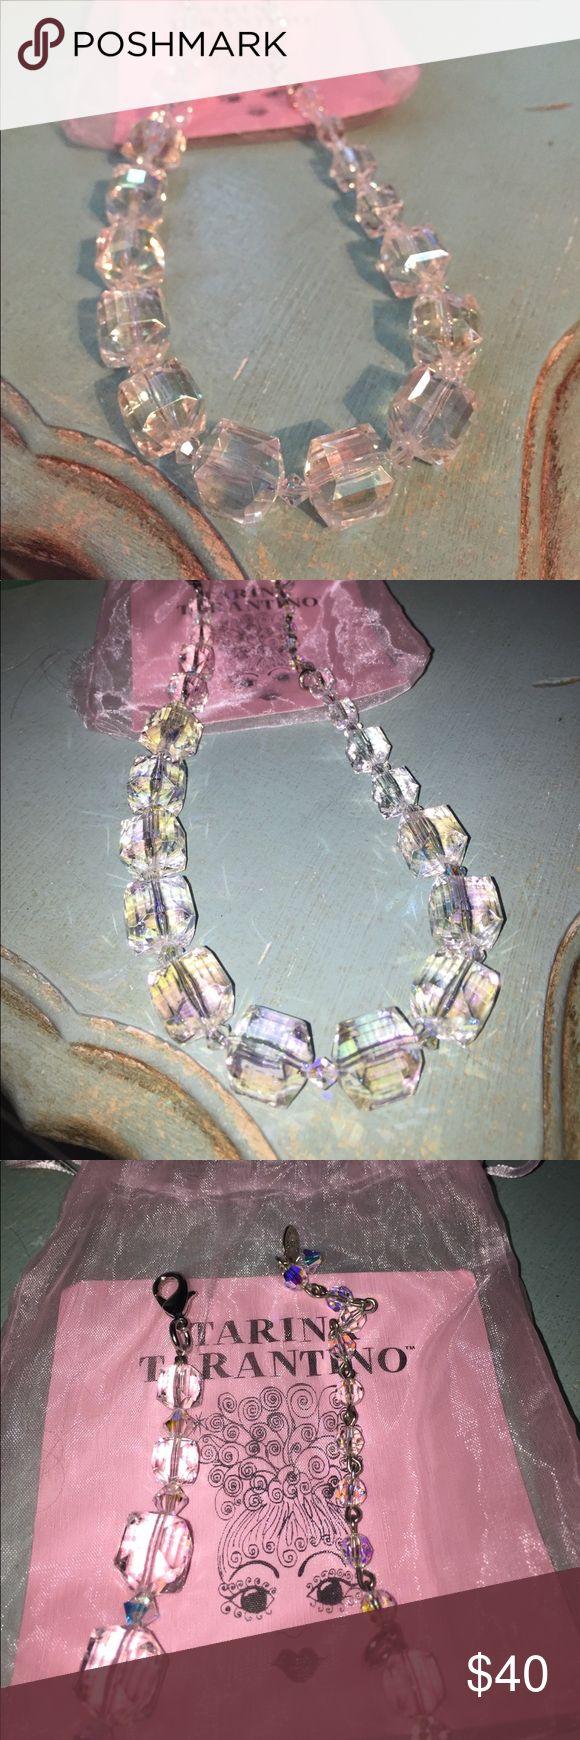 Tarina tarantino lucite necklace Tarina tarantino lucite necklace color is clear with a hologram shine to it Tarina Tarantino Jewelry Necklaces